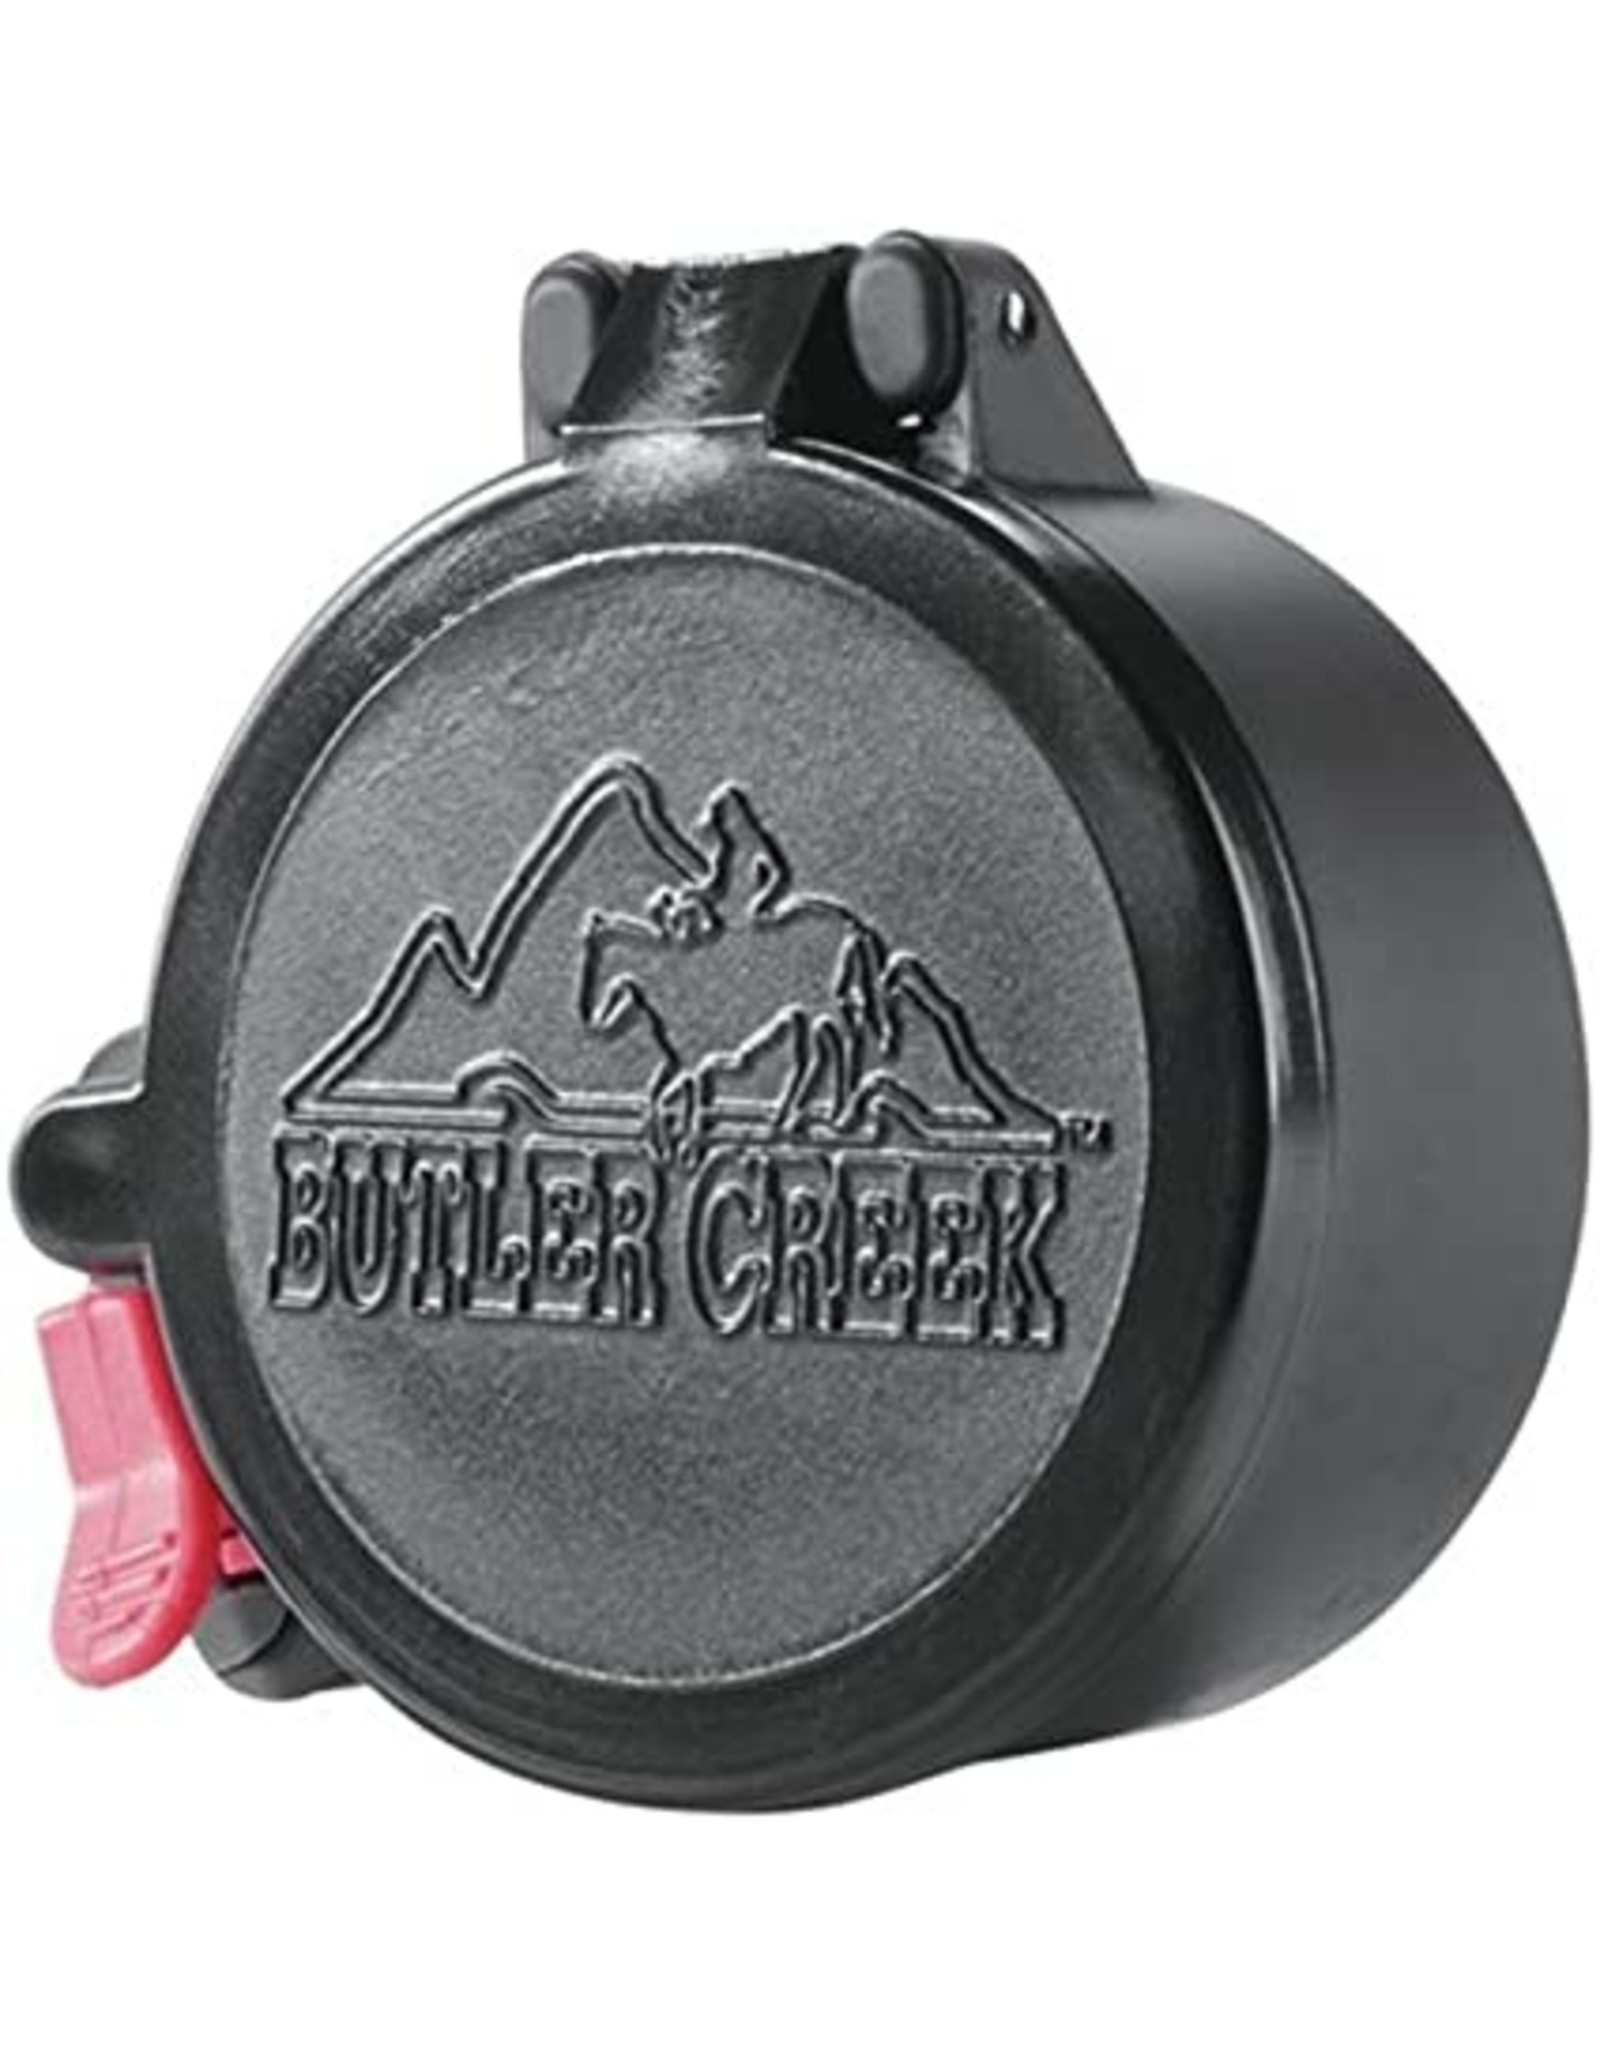 Butler Creek Butler Creek 19 Eye Flip Open Cap Scope Cover